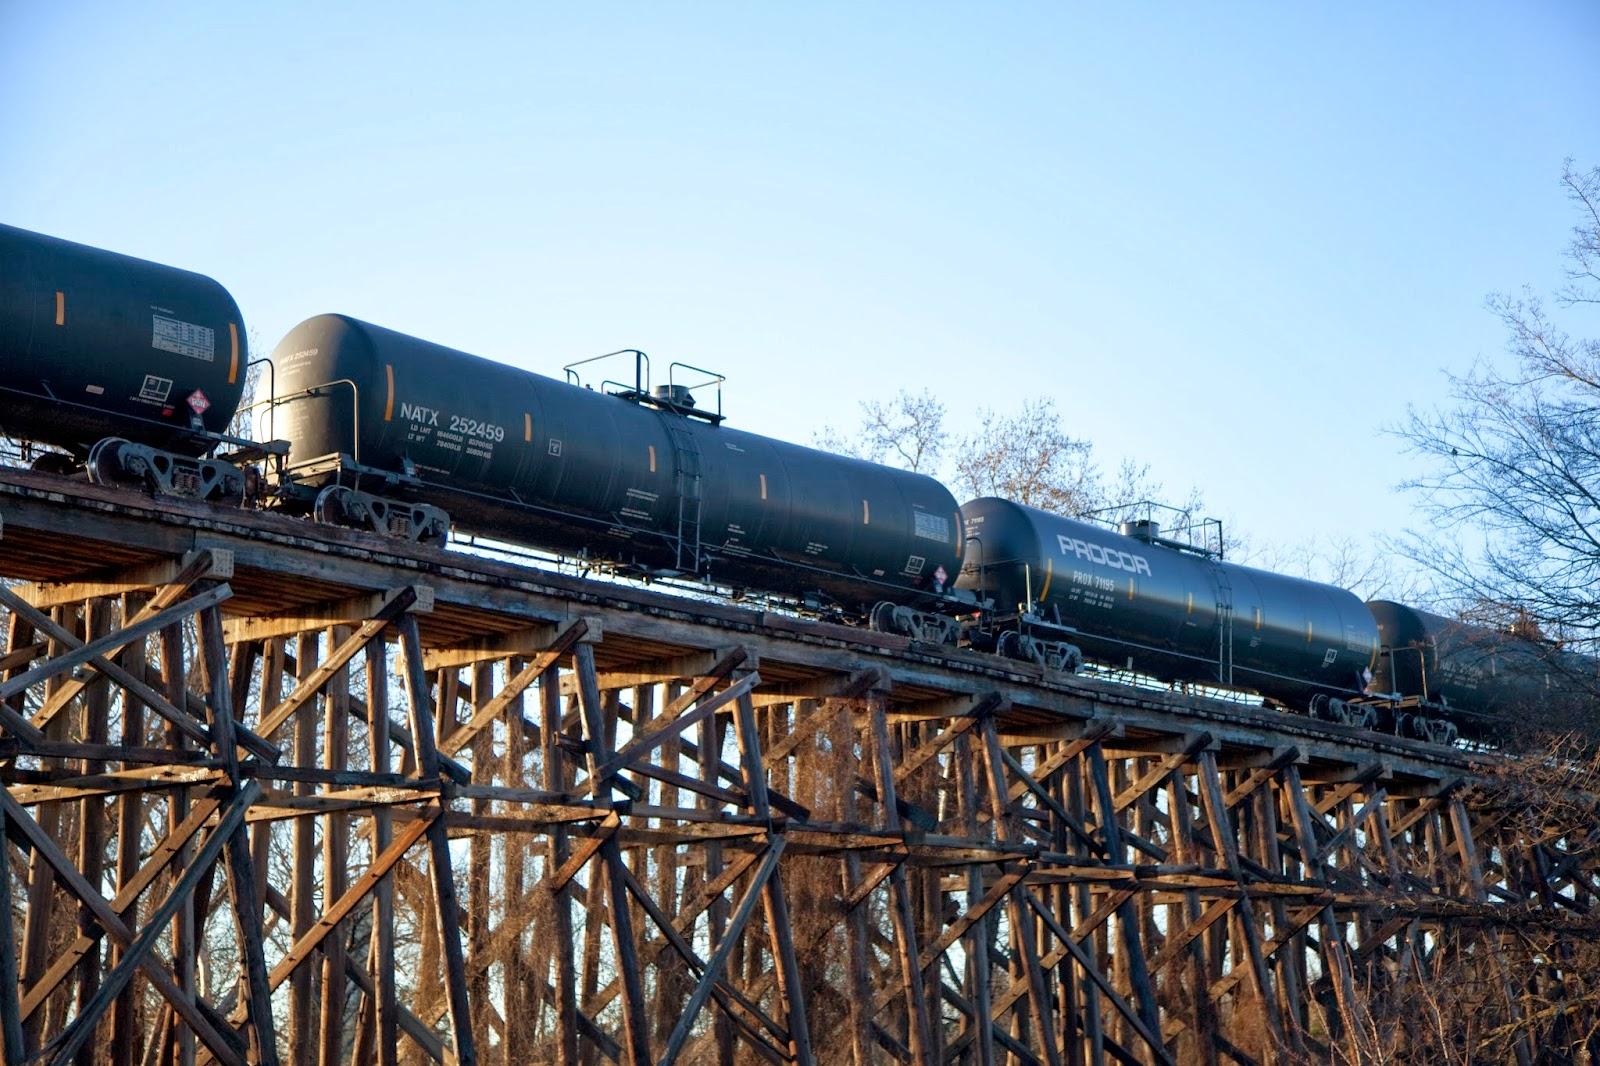 The Bakken Crude Debate Rail Cars Used To Ship Oil Called